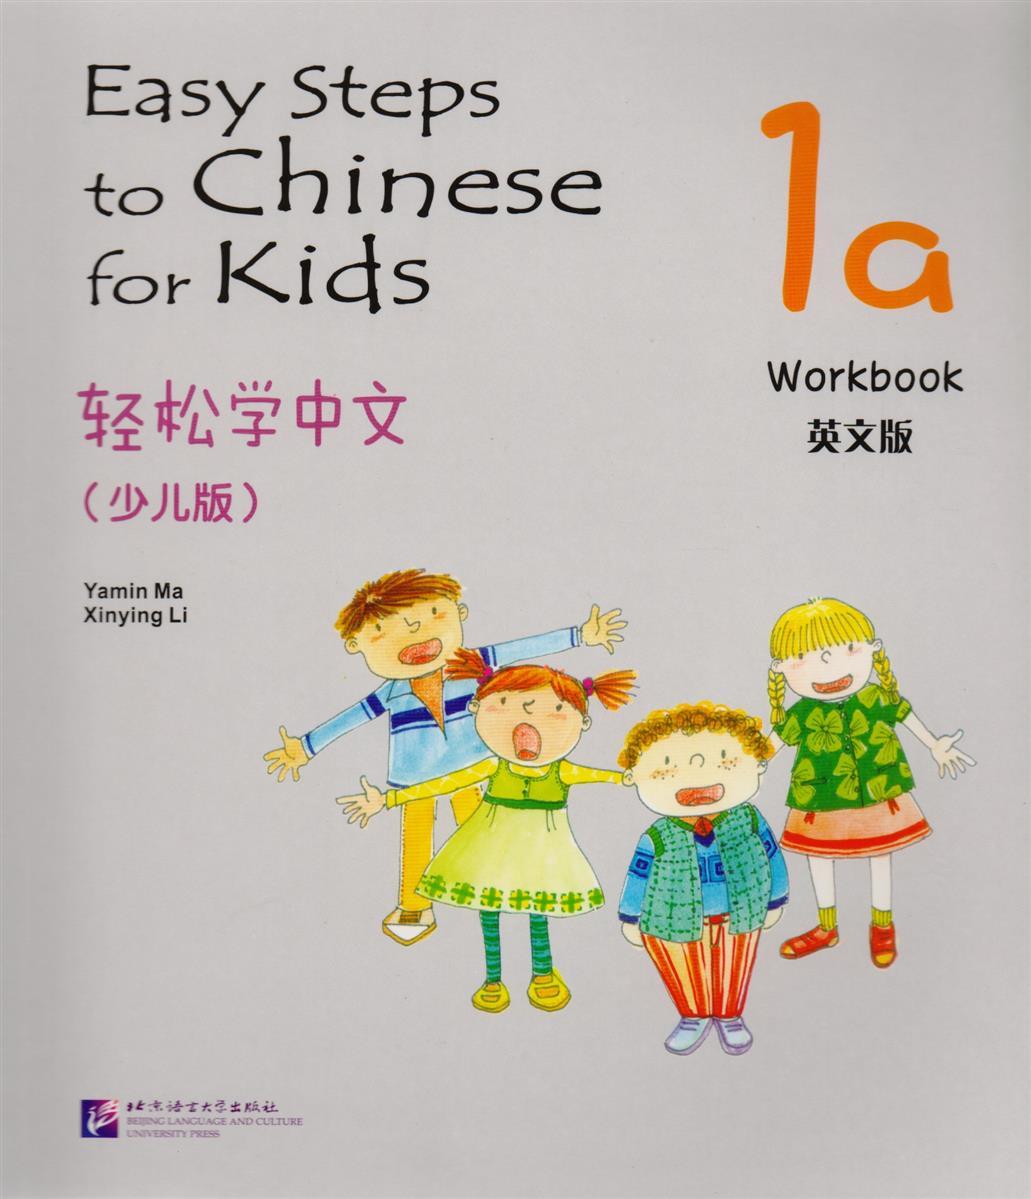 Yamin Ma Easy Steps to Chinese for kids 1A - WB / Легкие Шаги к Китайскому для детей. Часть 1A - Рабочая тетрадь (на китайском и английском языках) easy step to chinese for kids 3b textbook books in english for children chinese language beginner to study chinese